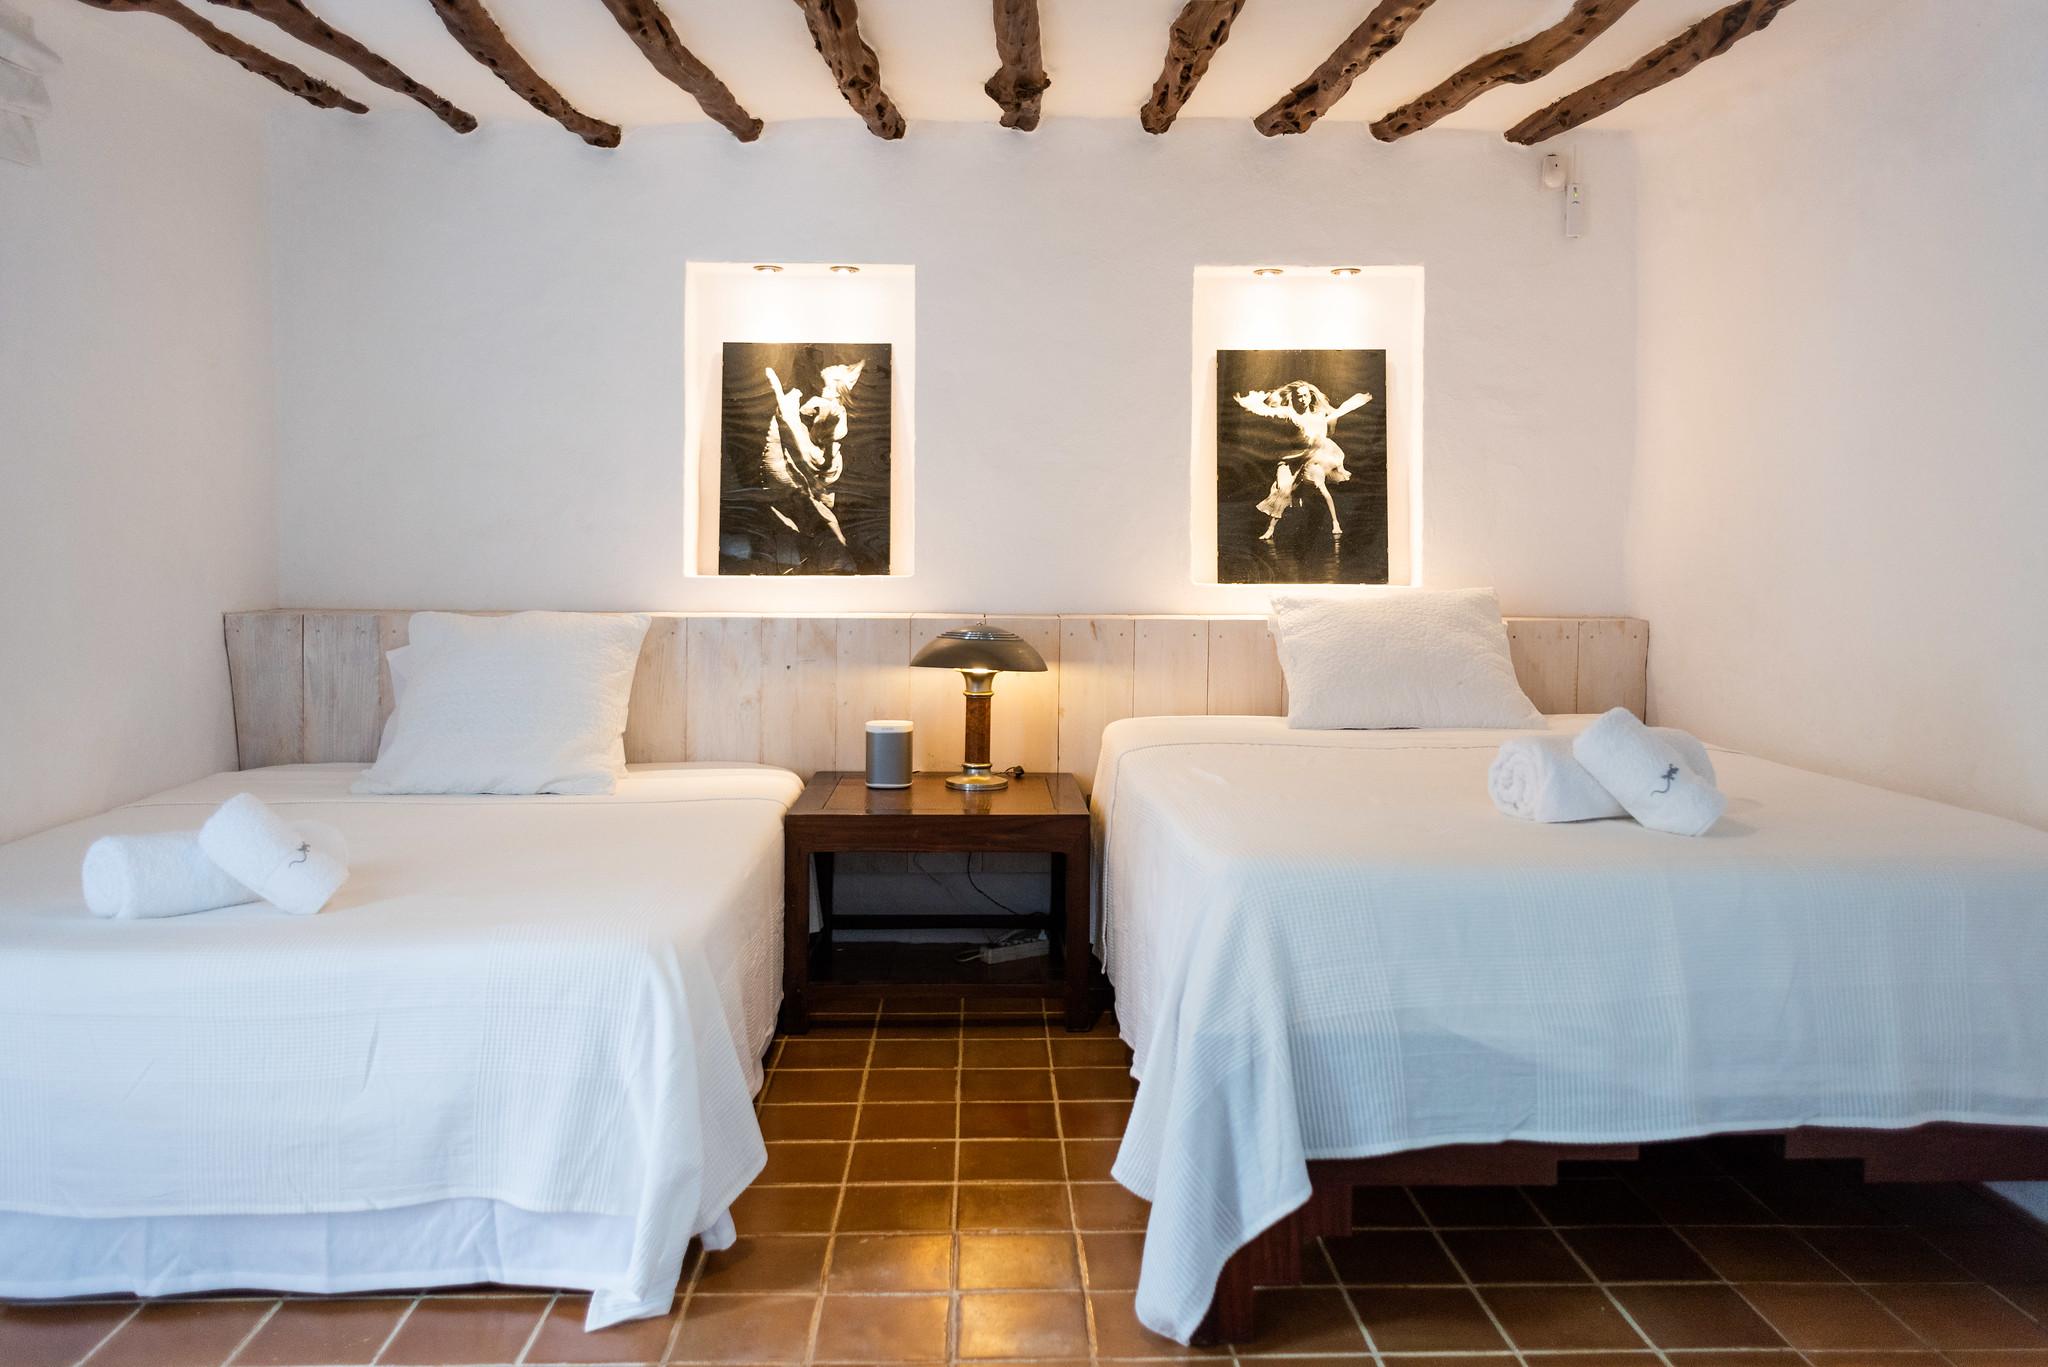 https://www.white-ibiza.com/wp-content/uploads/2020/05/white-ibiza-villas-can-lyra-twin-room.jpg